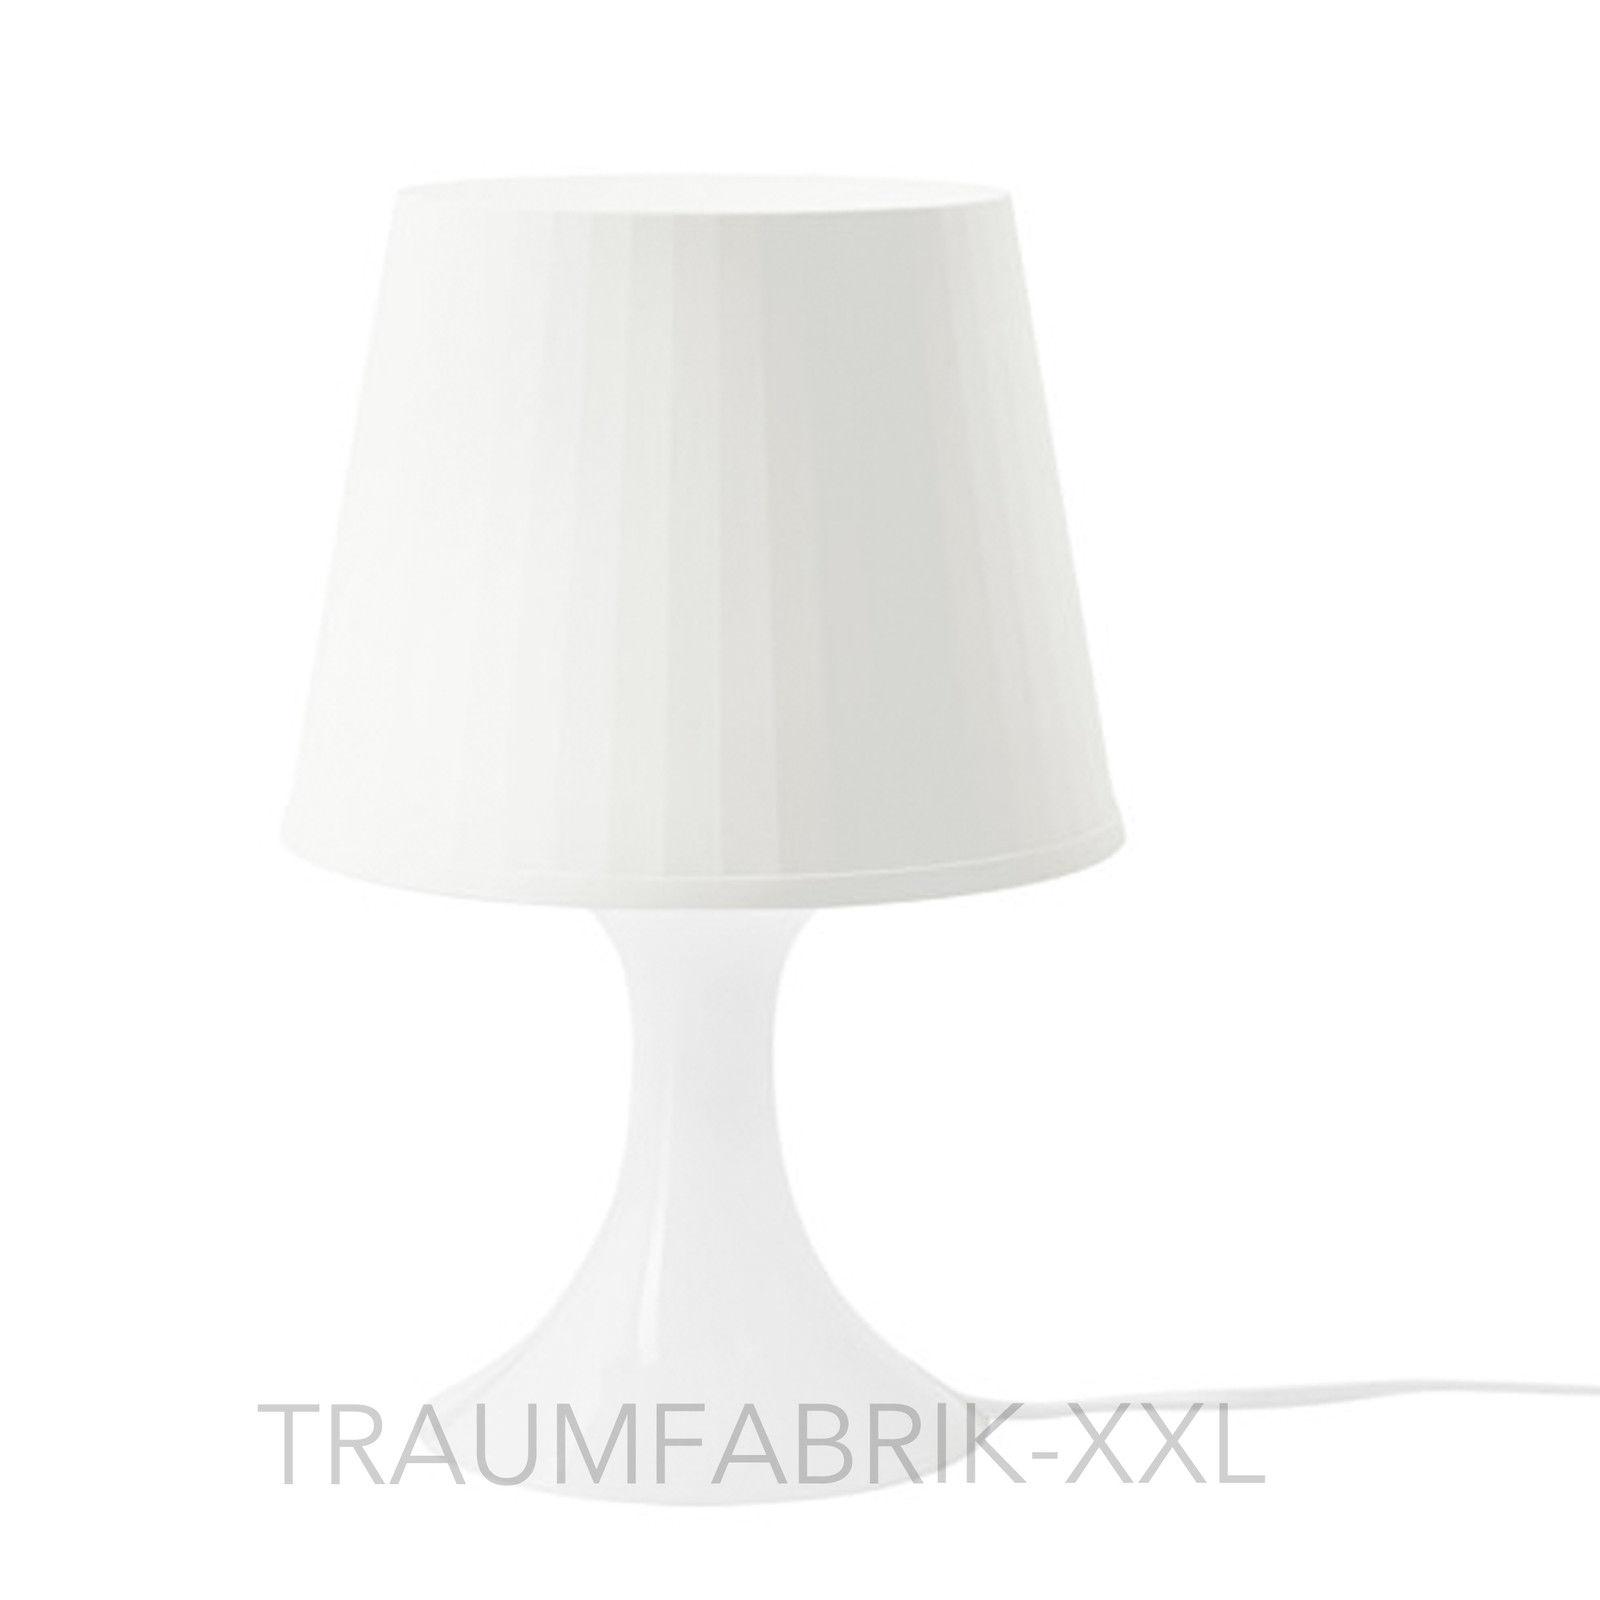 Badezimmer Lampen Ikea | Ikea Lampe Bad Ikea Bad Lampe Badezimmer ...